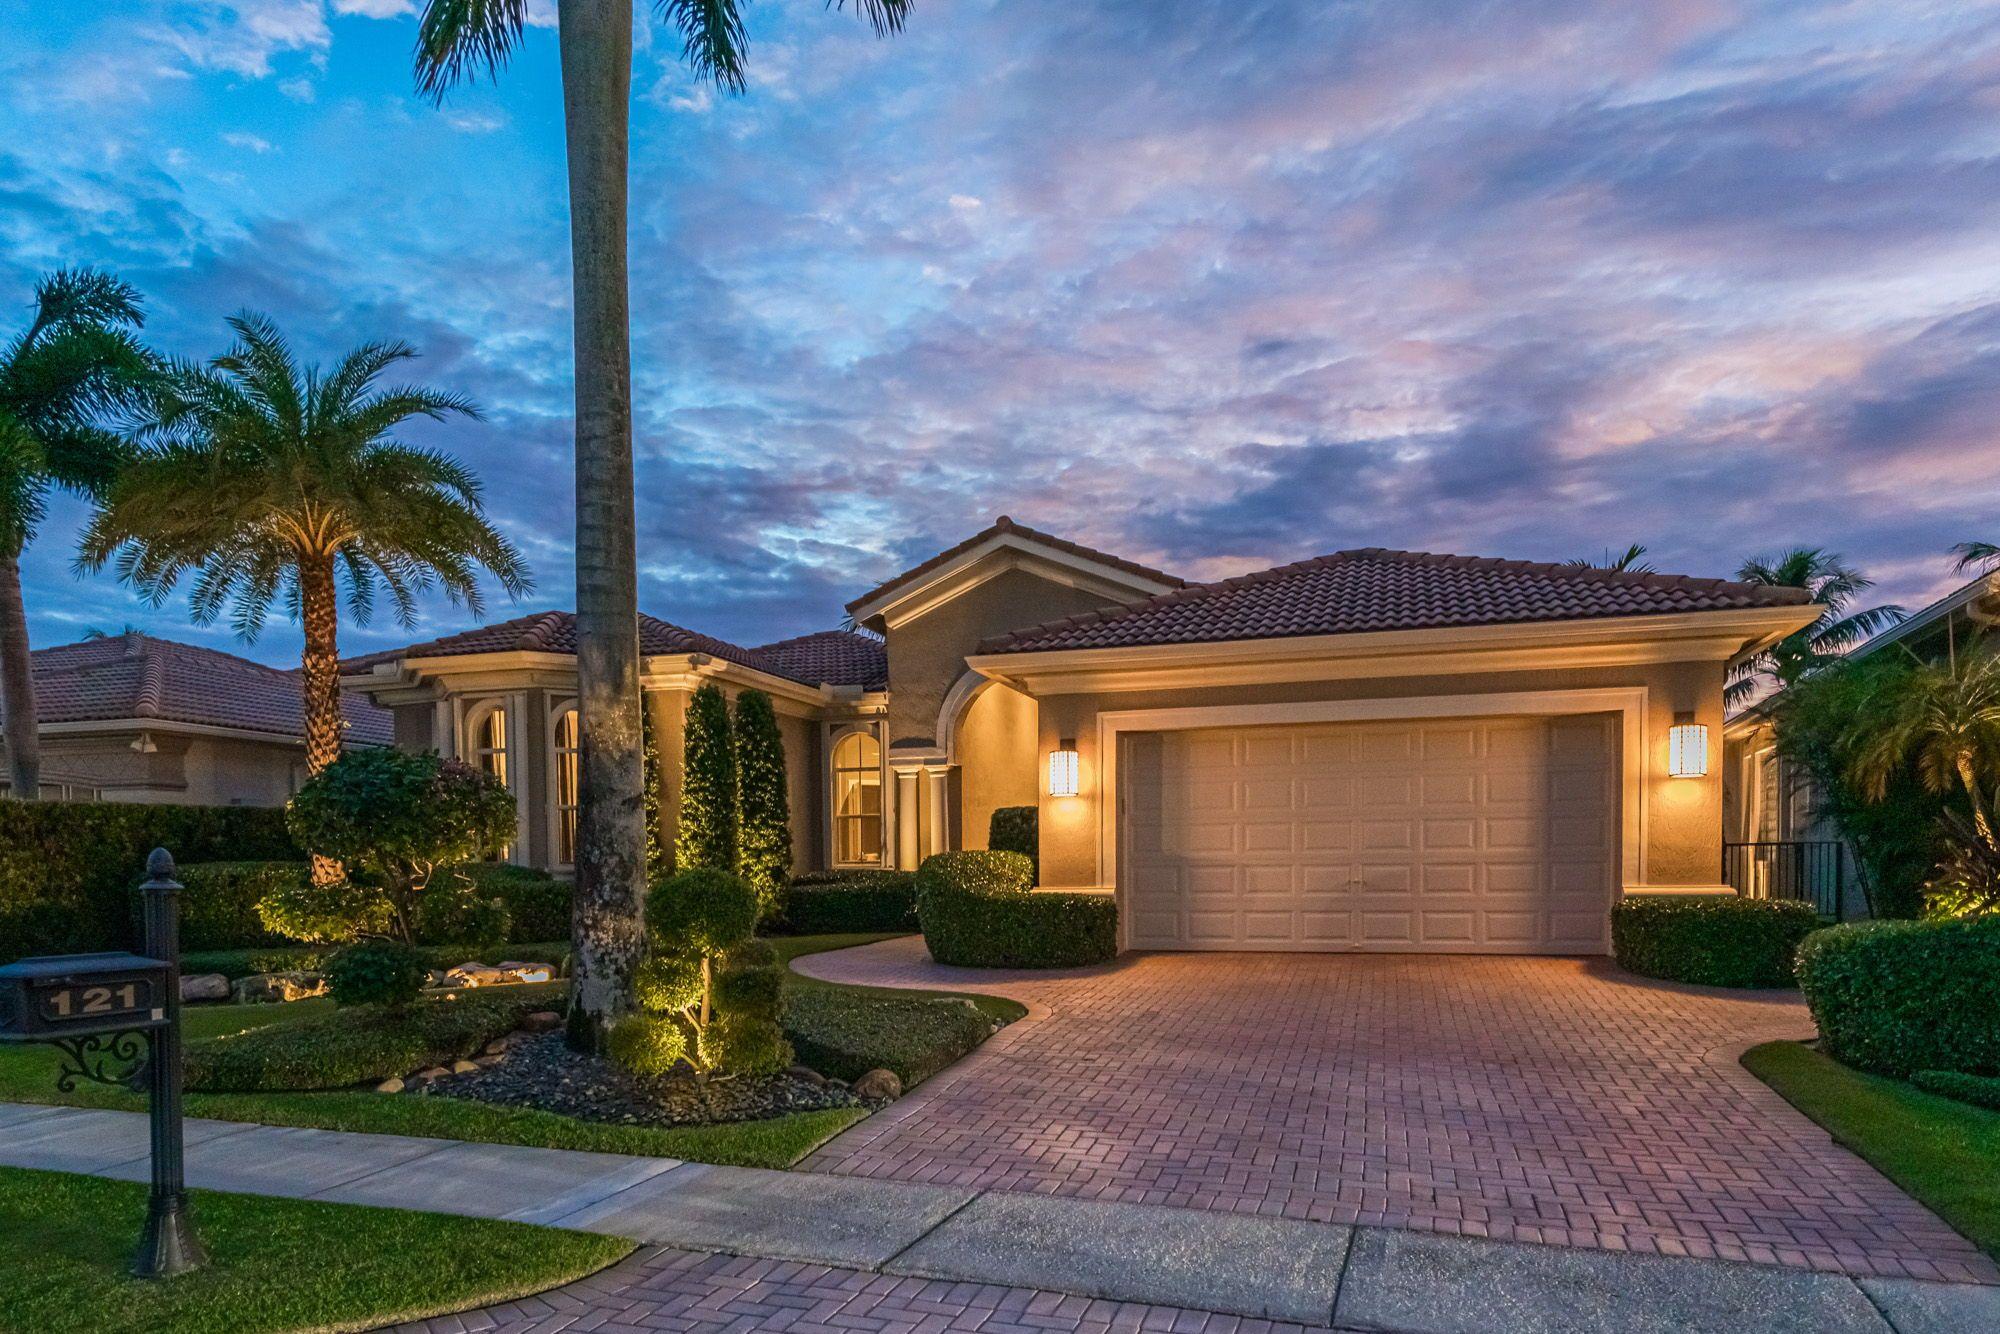 f19da90770f5fed447f72e3b8708d1d0 - Real Estate Agents In Palm Beach Gardens Fl